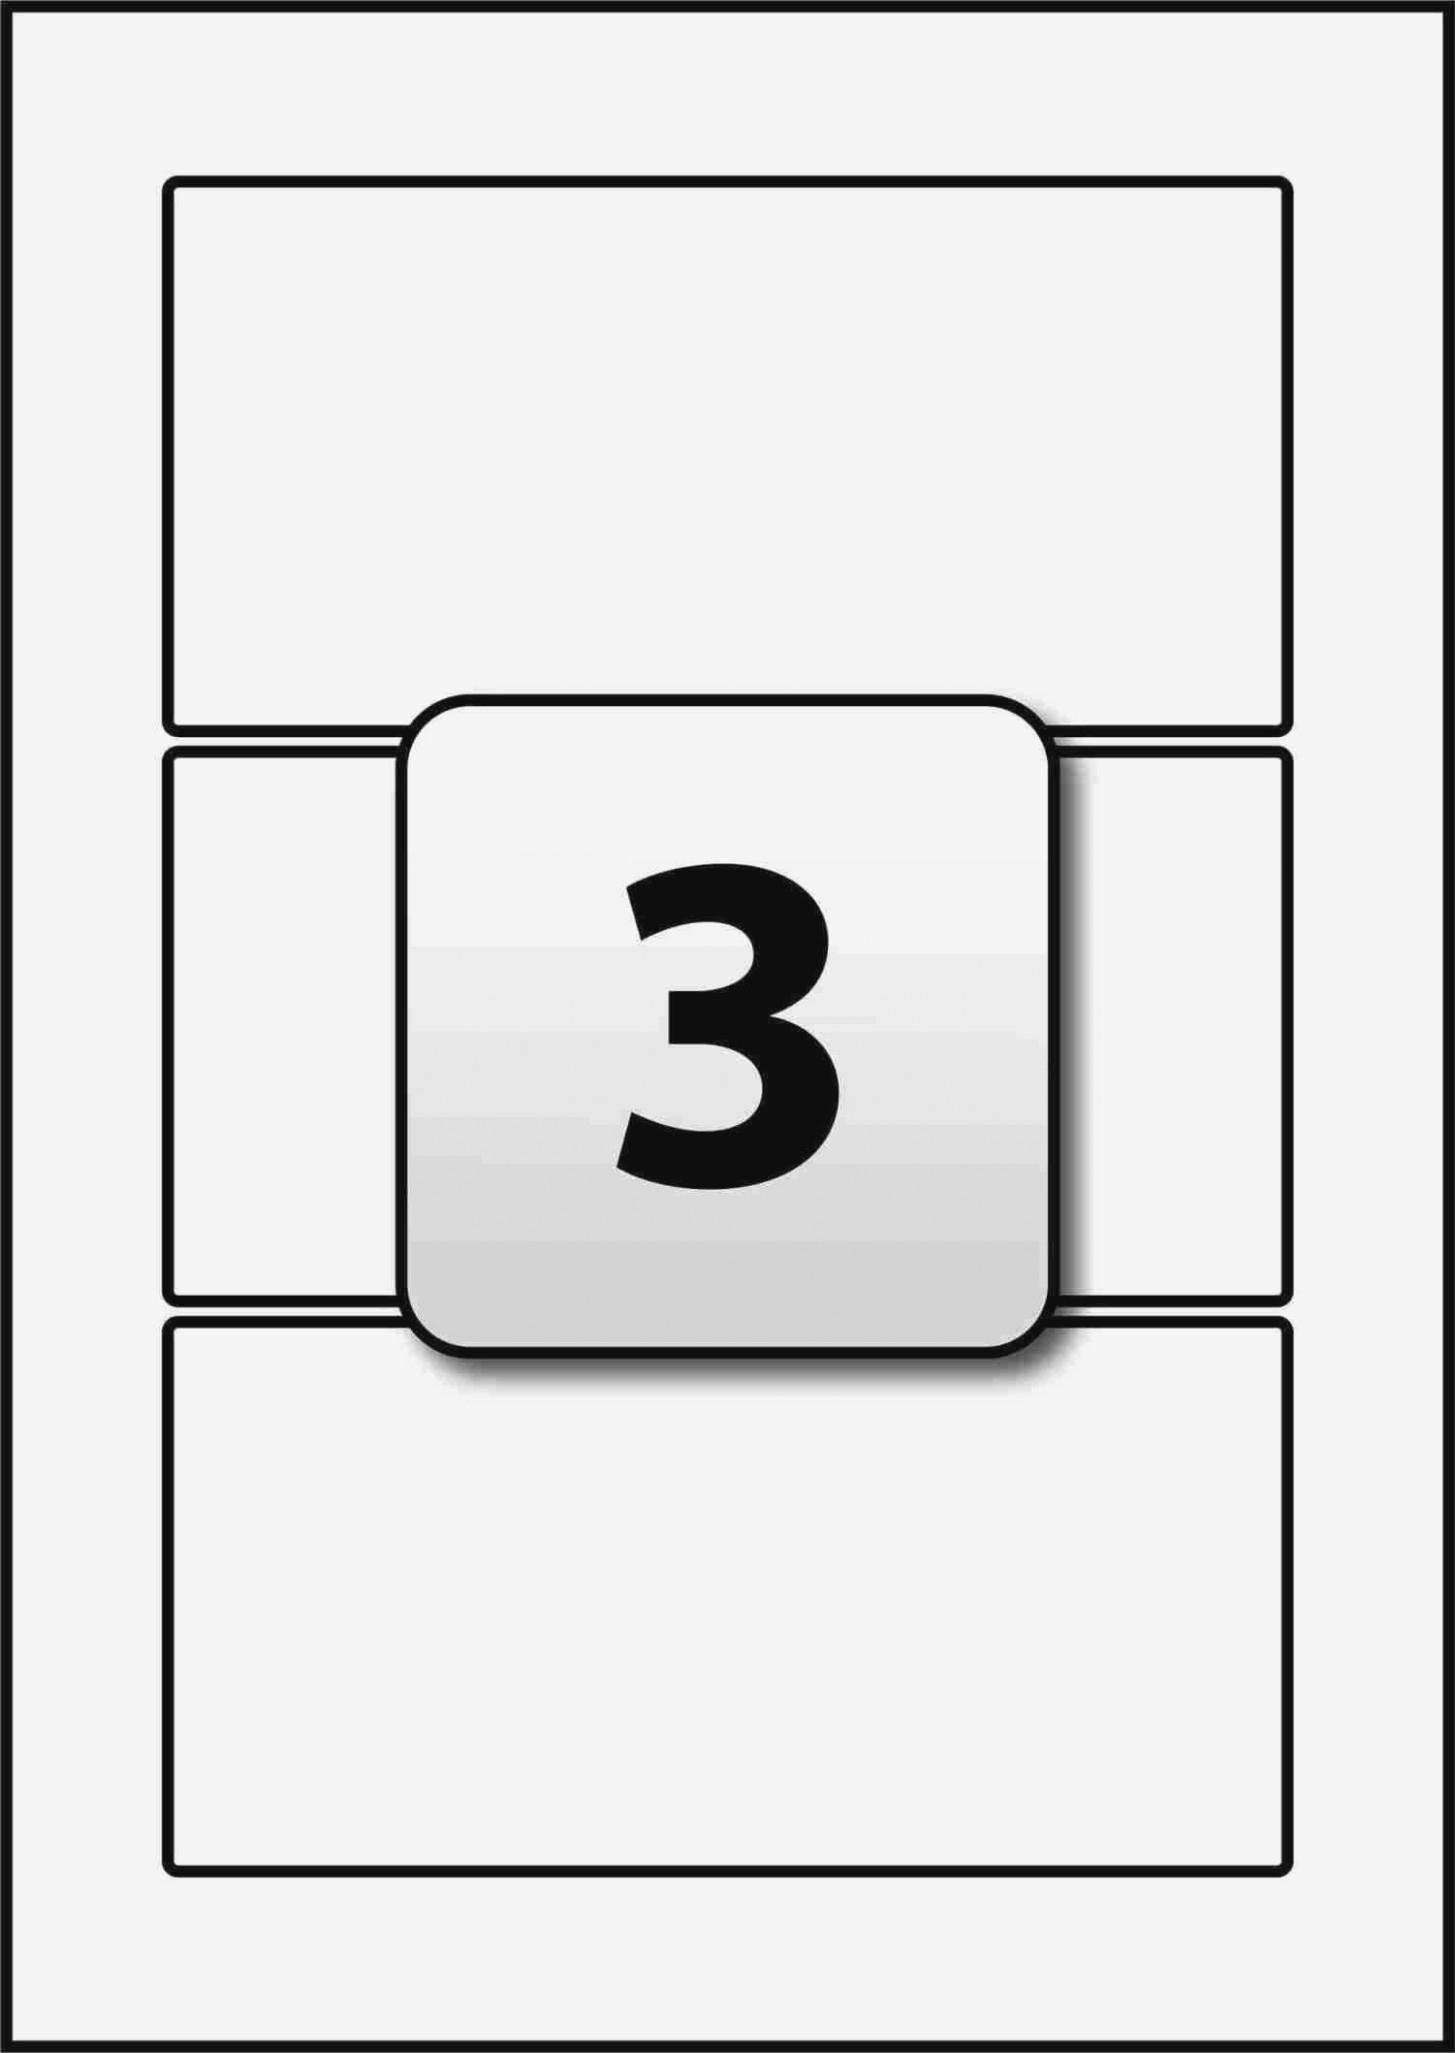 Word Label Template 15 Per Sheet | Template Designs And With Word Label Template 12 Per Sheet